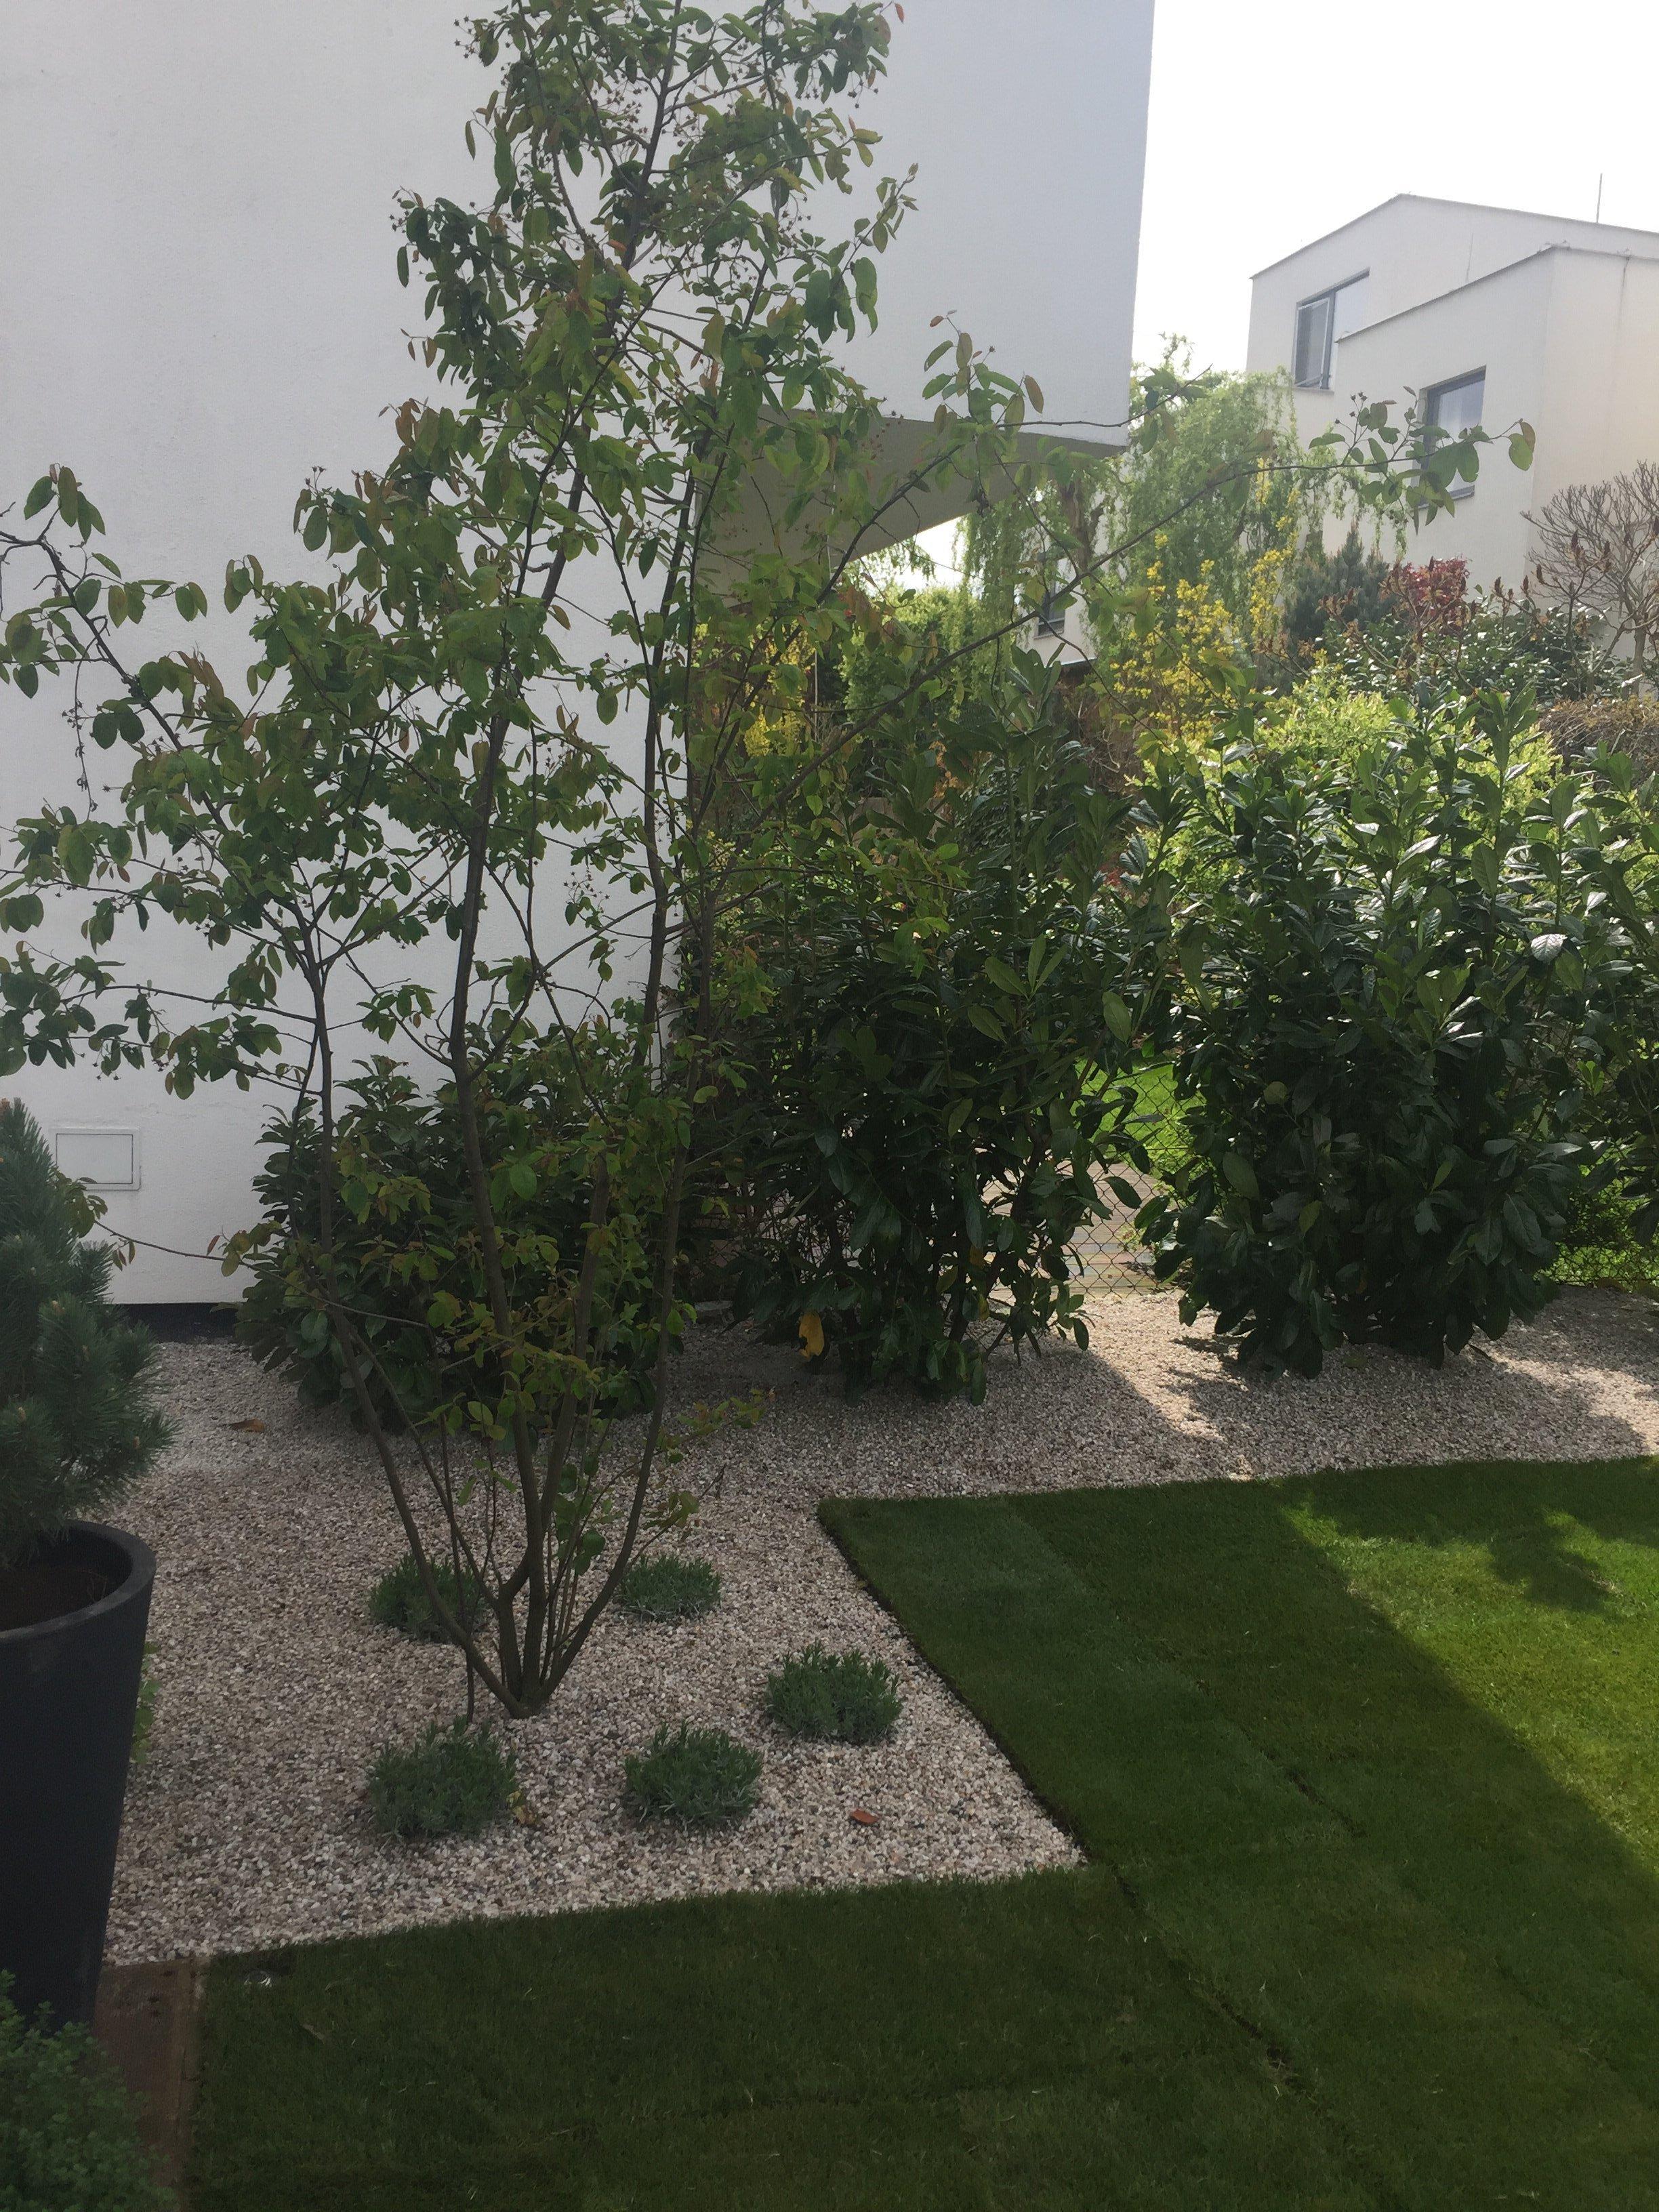 Mala moderni zahrada